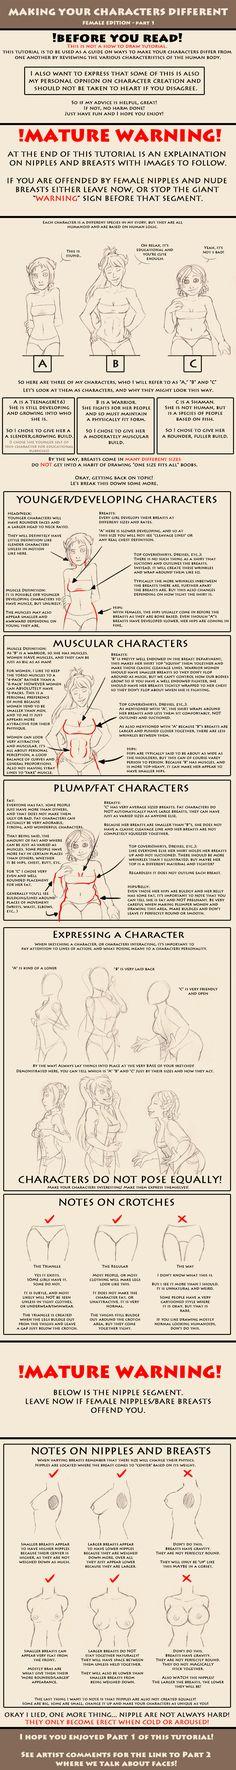 Making your characters different! Women - Part1 by JeniferHarris.deviantart.com on @deviantART